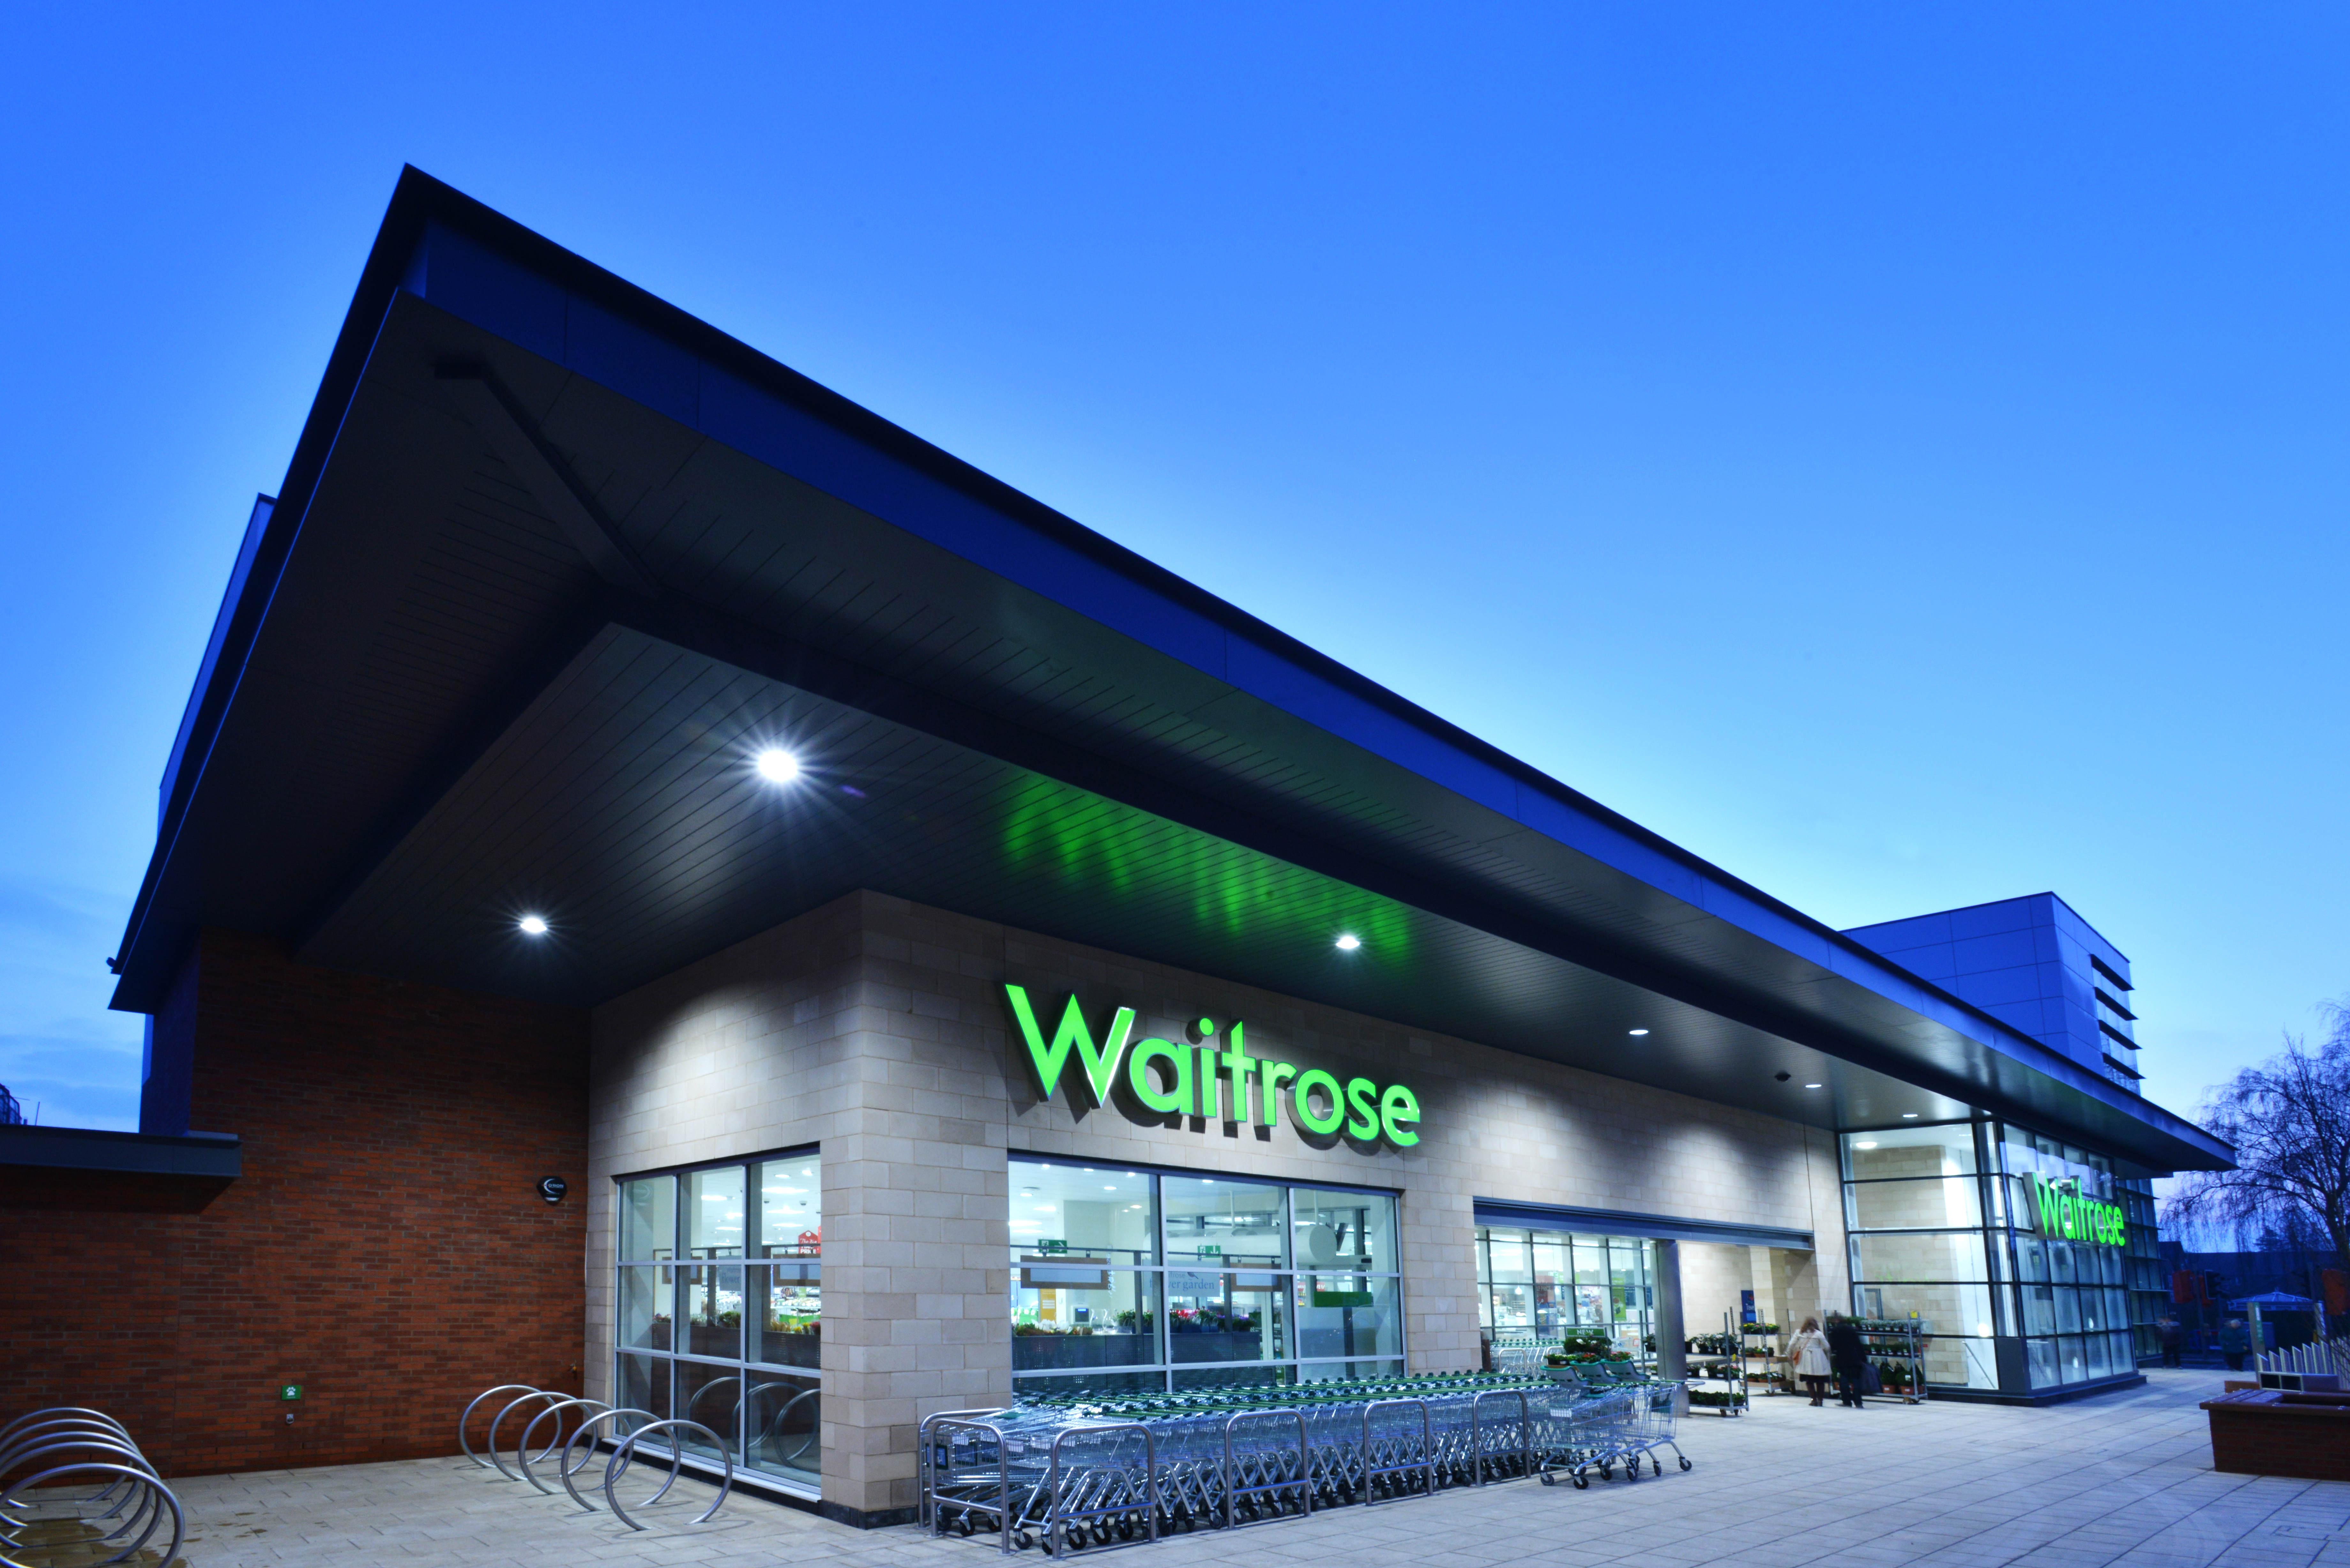 Waitrose to create 2,000 British jobs across the UK in 2015